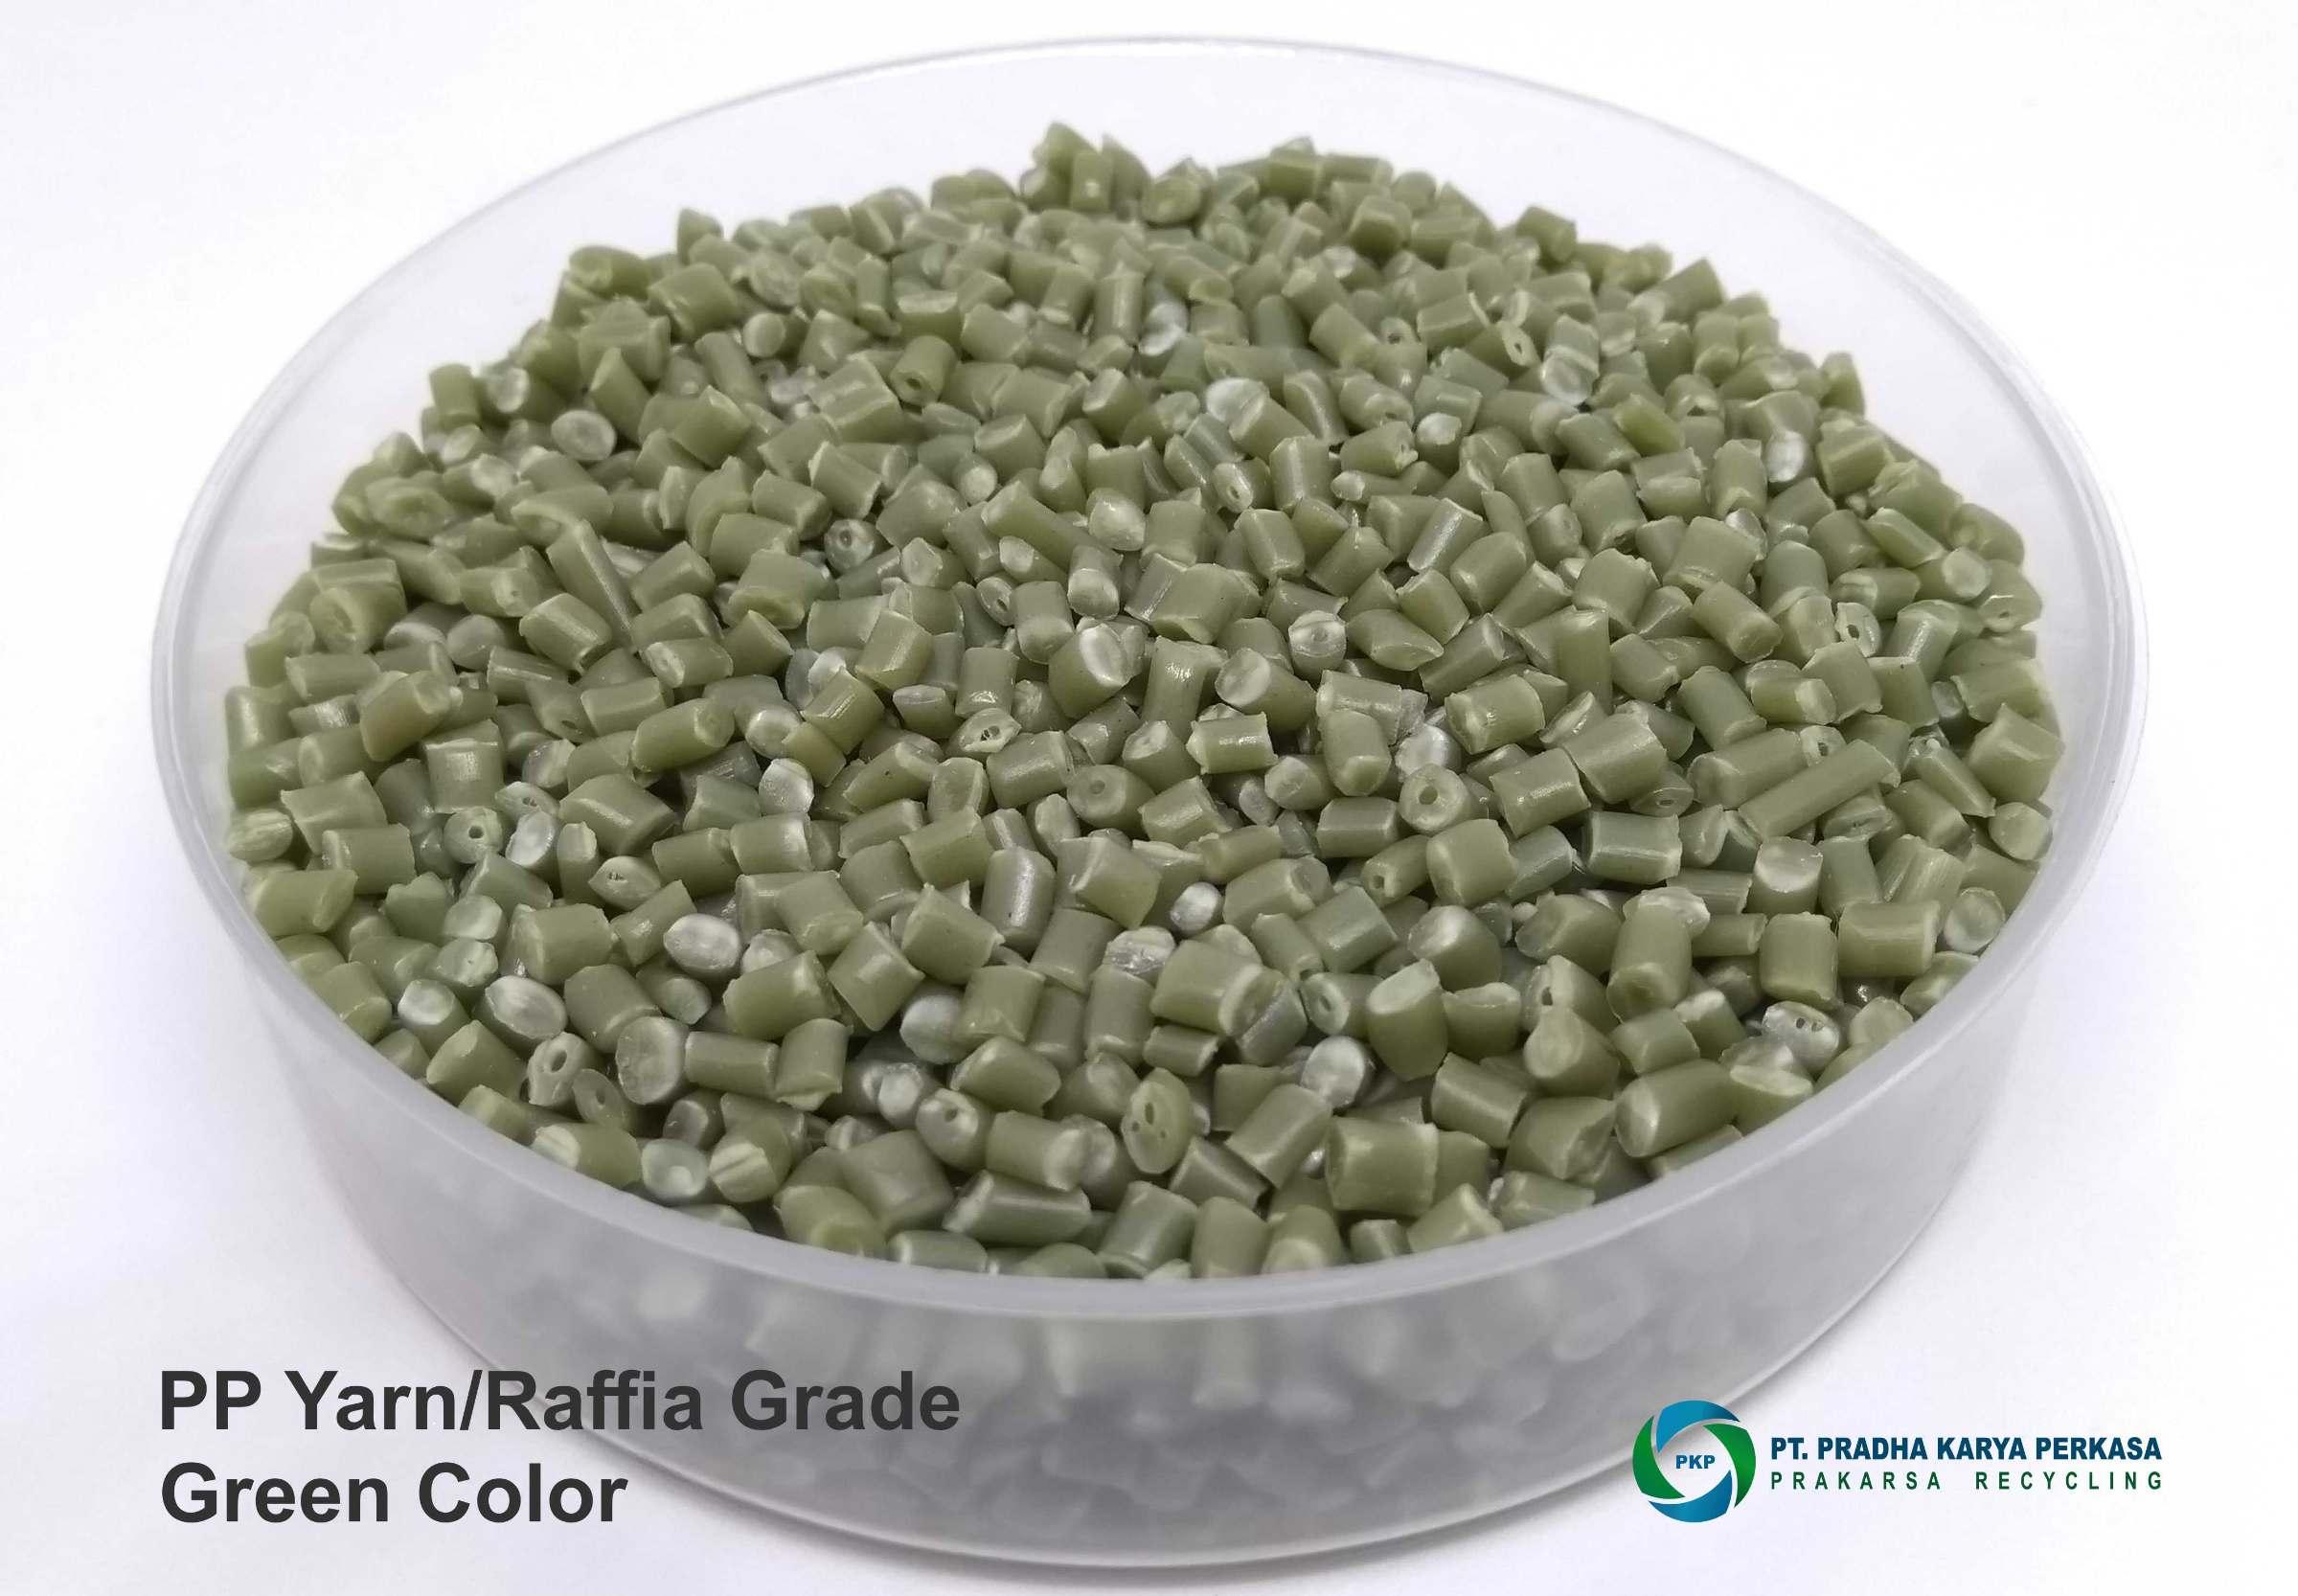 PP Yarn Green Color 7122